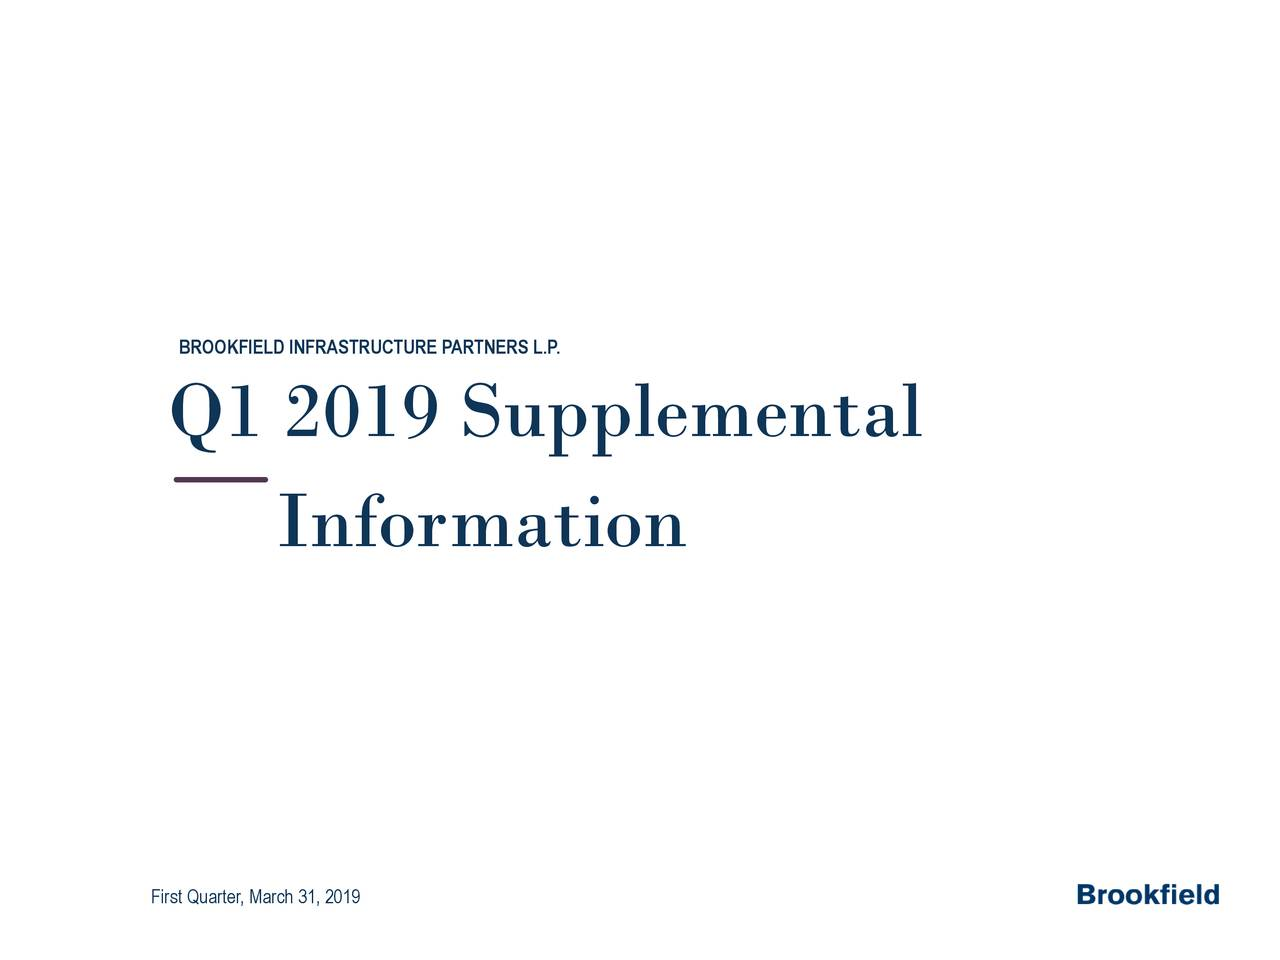 Q1 2019 Supplemental Information First Quarter, March 31, 2019